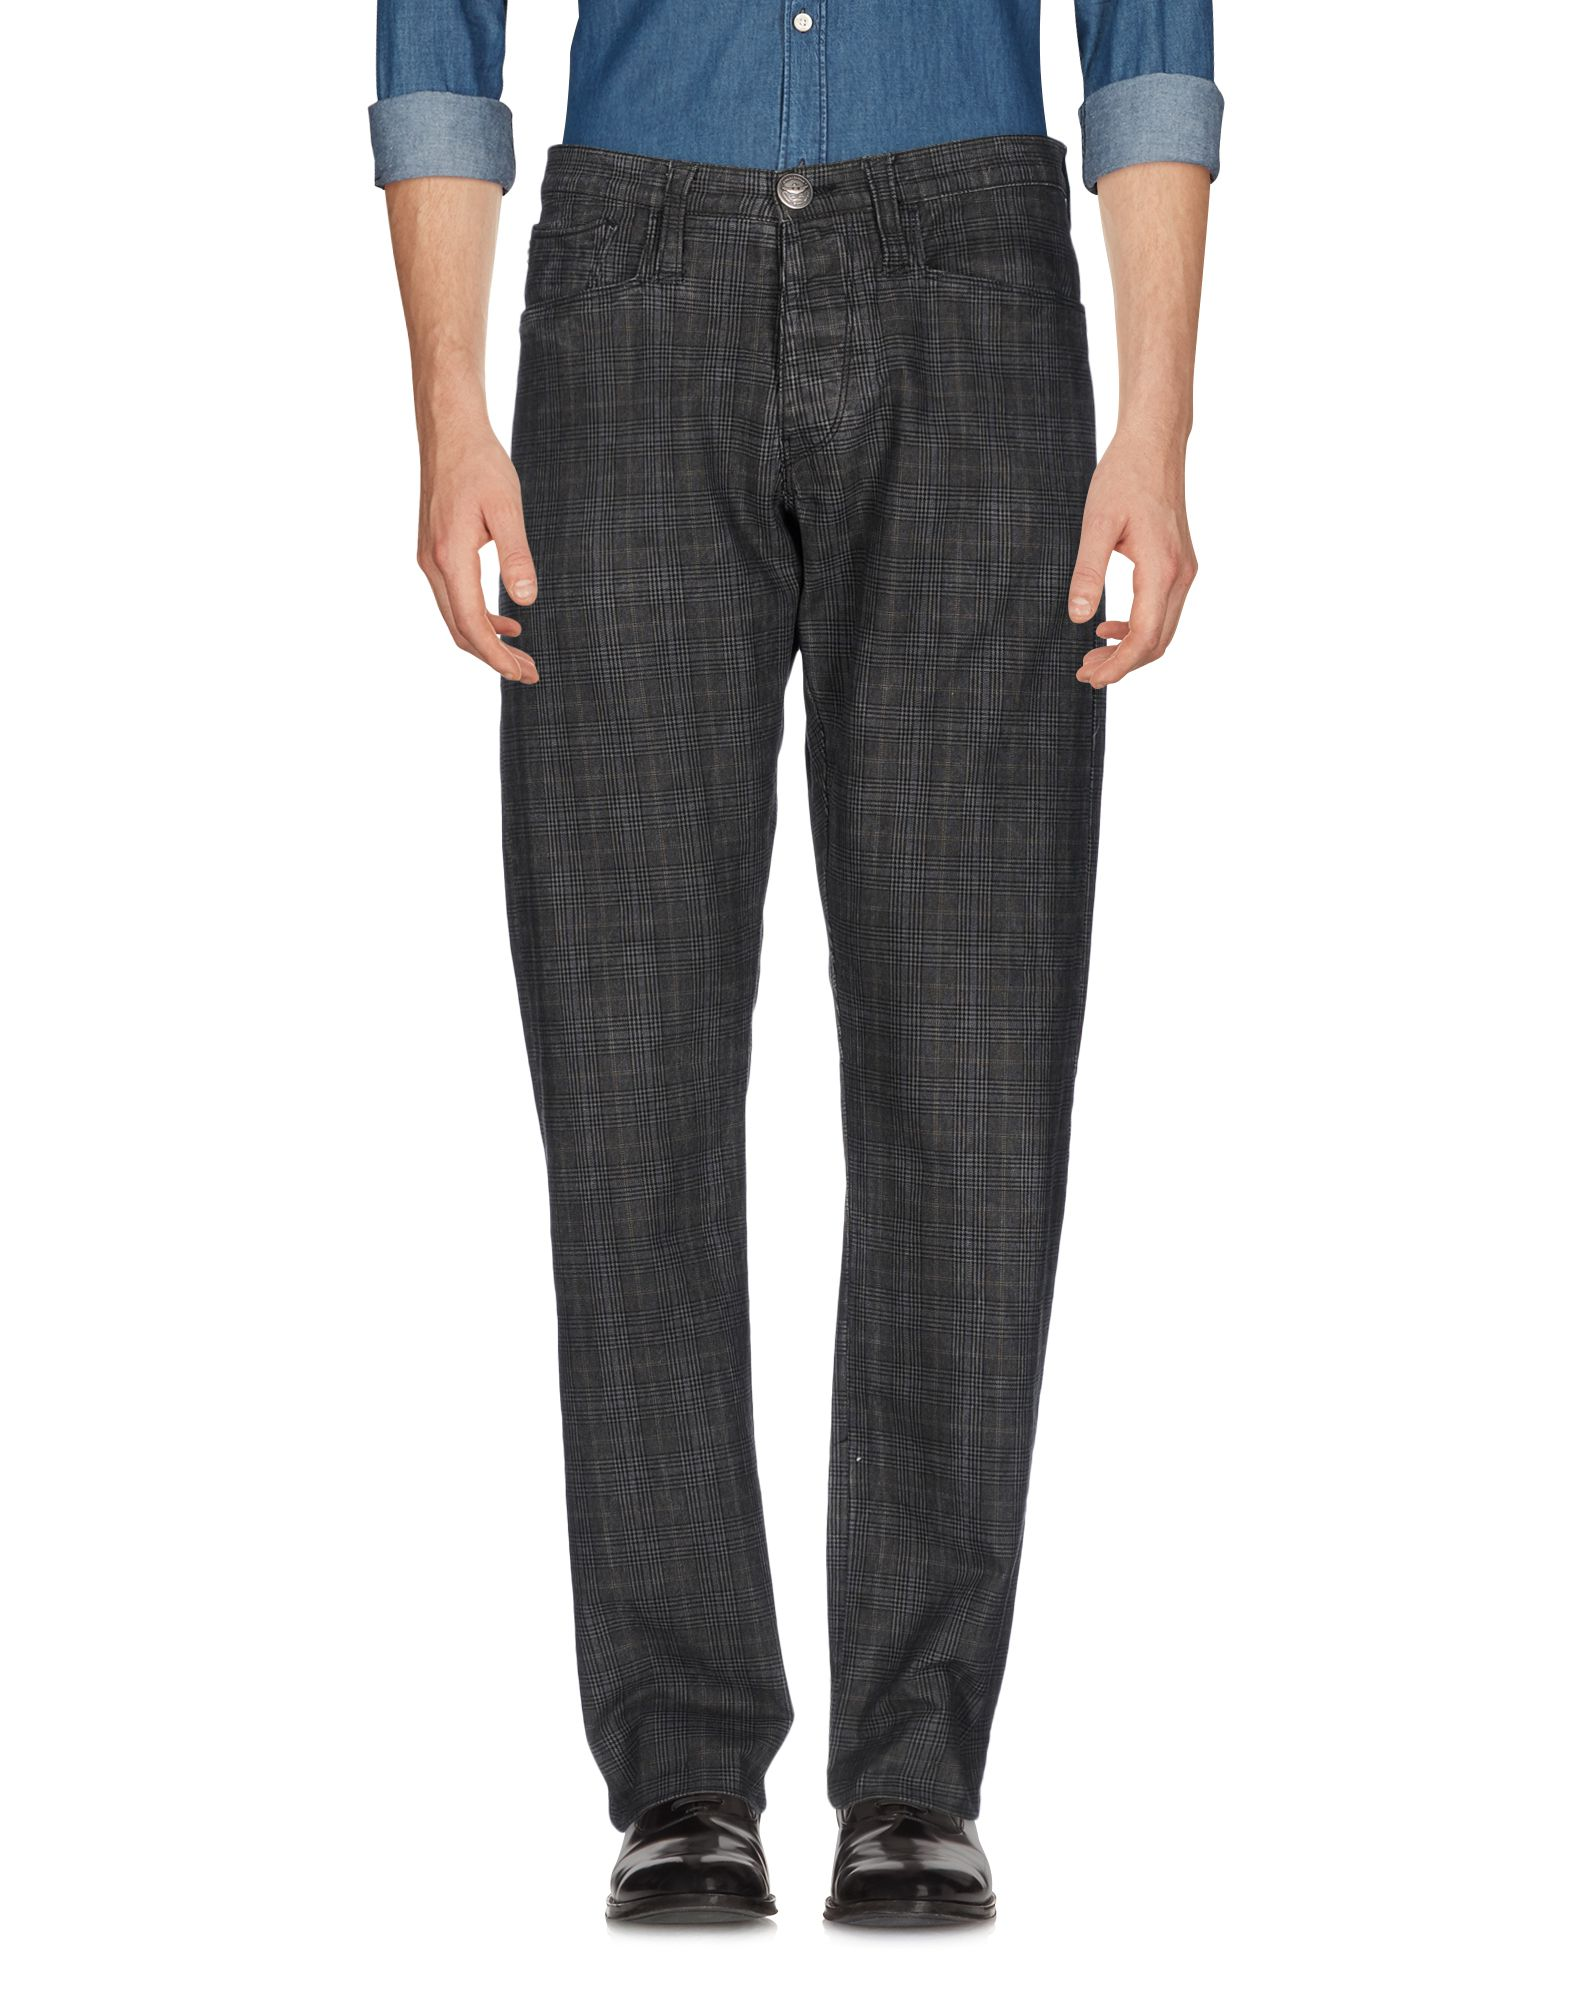 Pantalone Armani Jeans Uomo - - Uomo 13092613QI a7a108